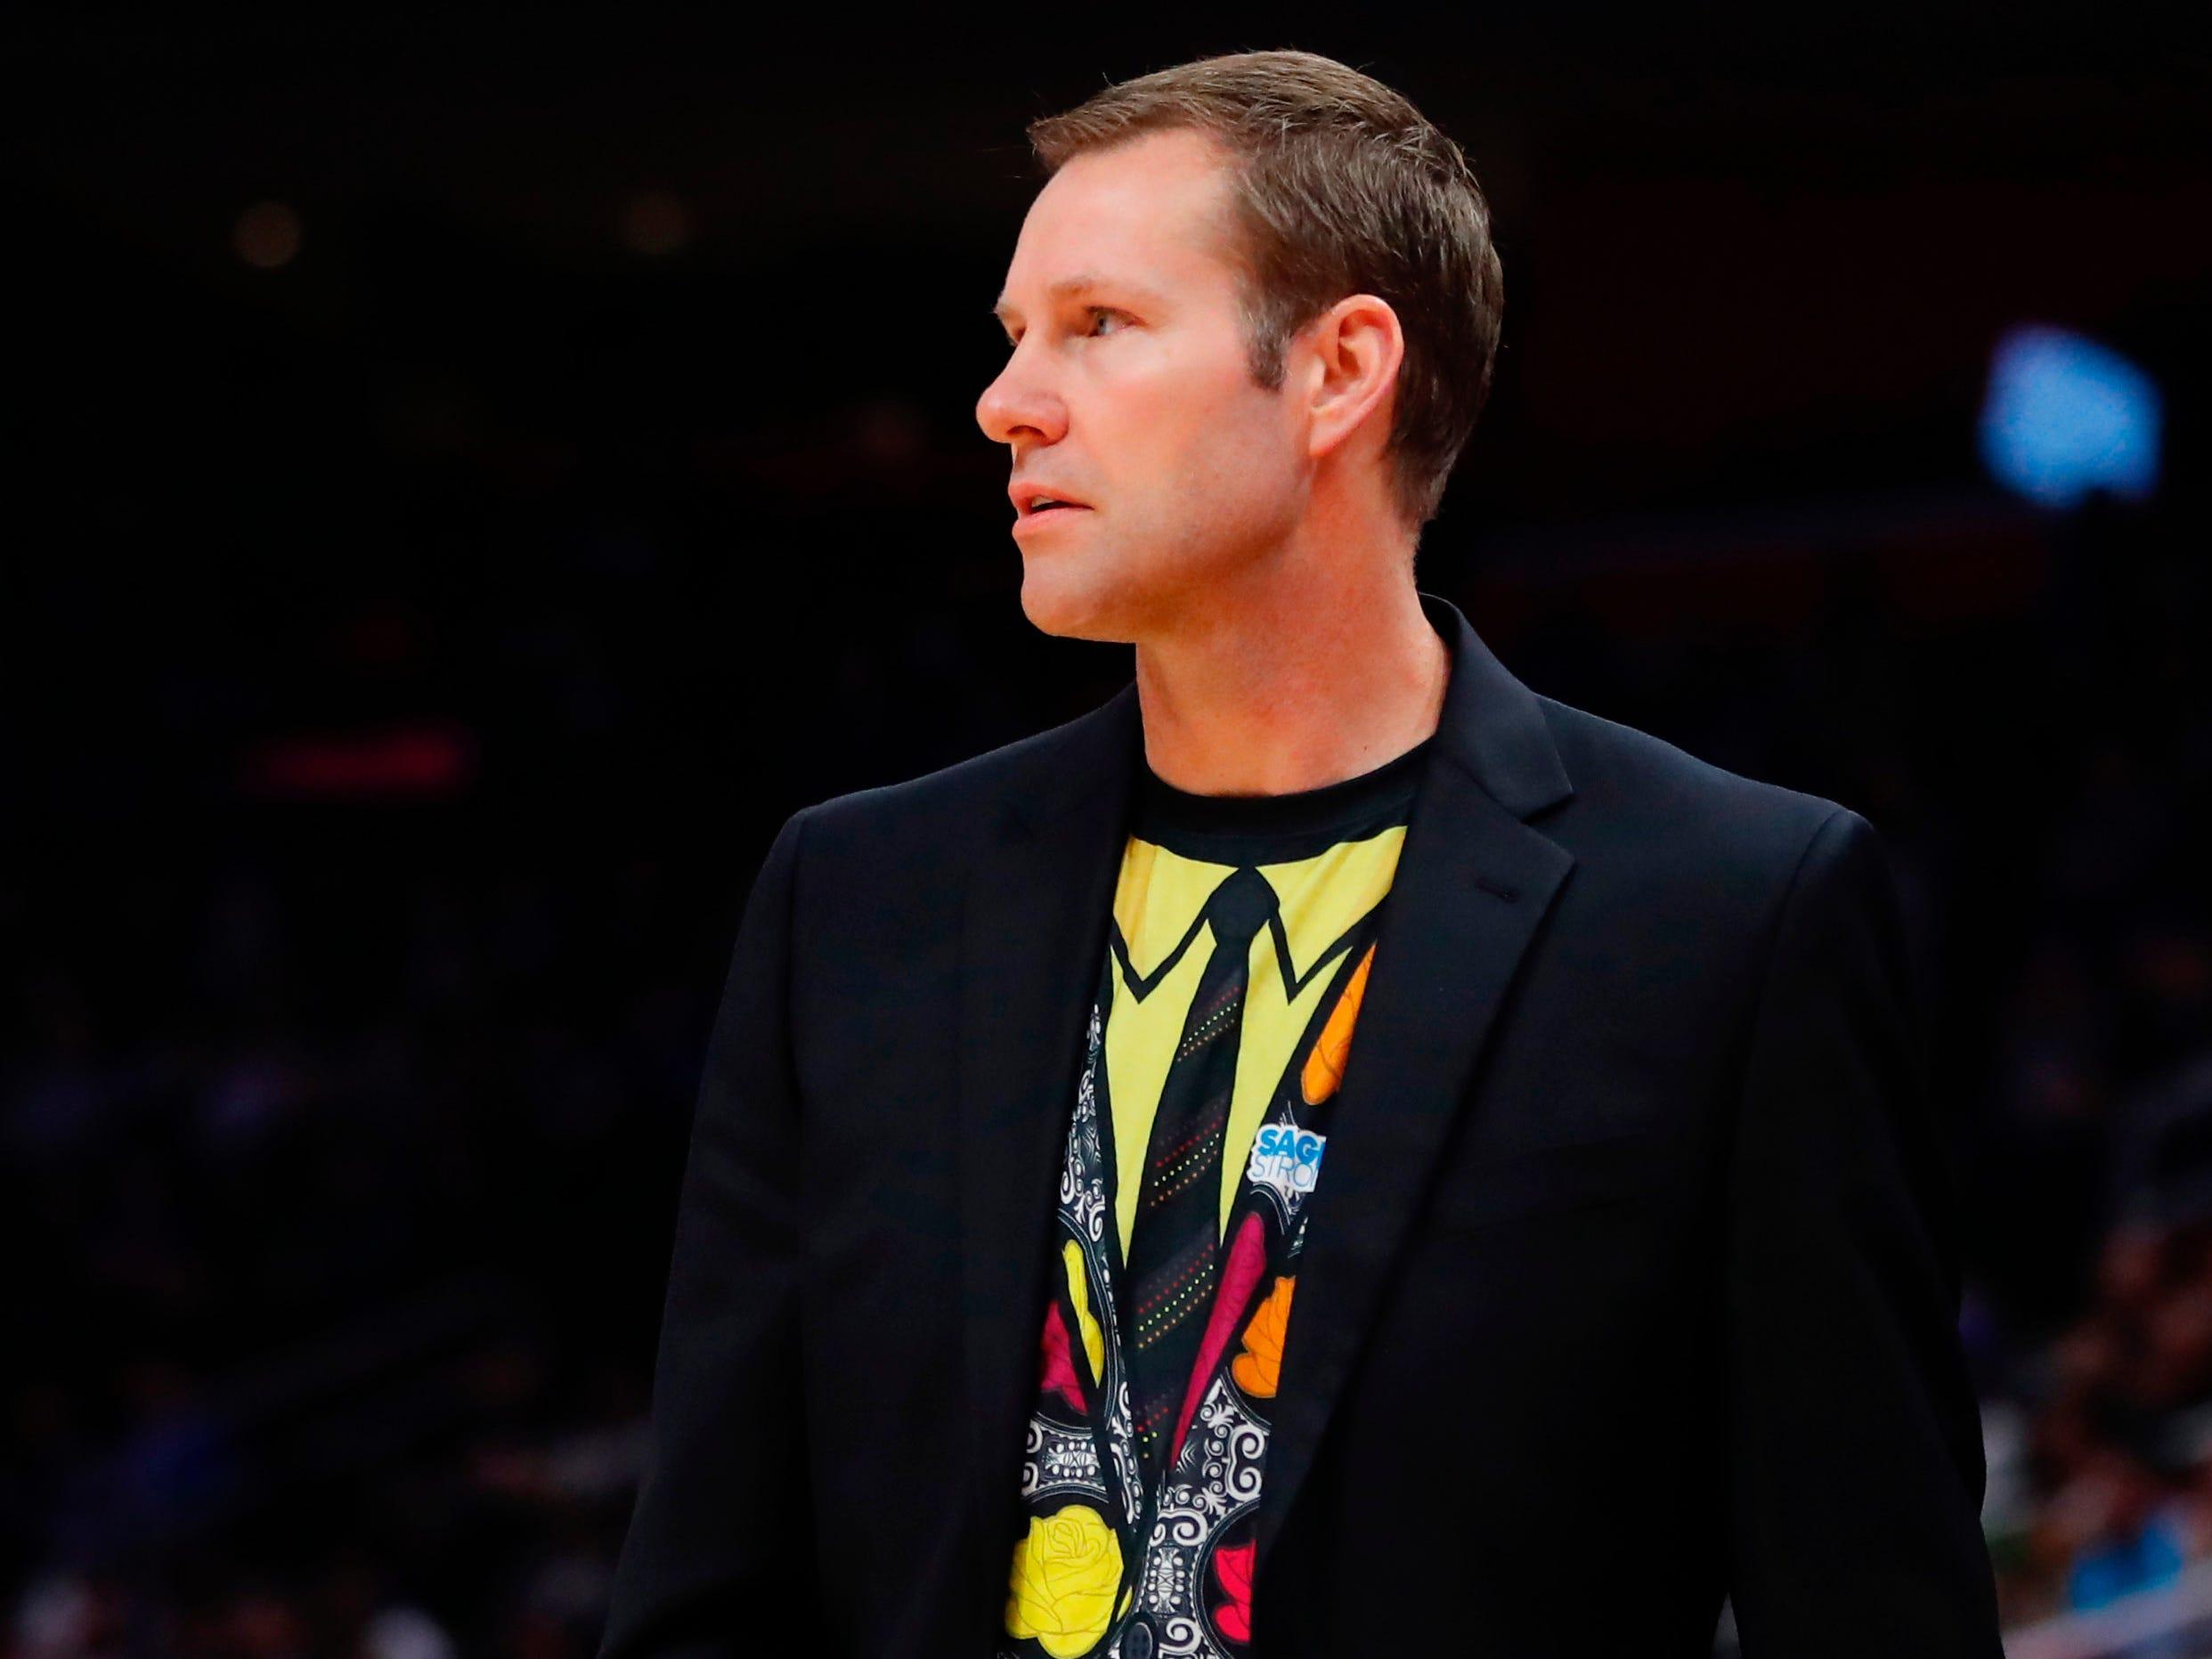 Nov. 30: Chicago Bulls coach Fred Hoiberg